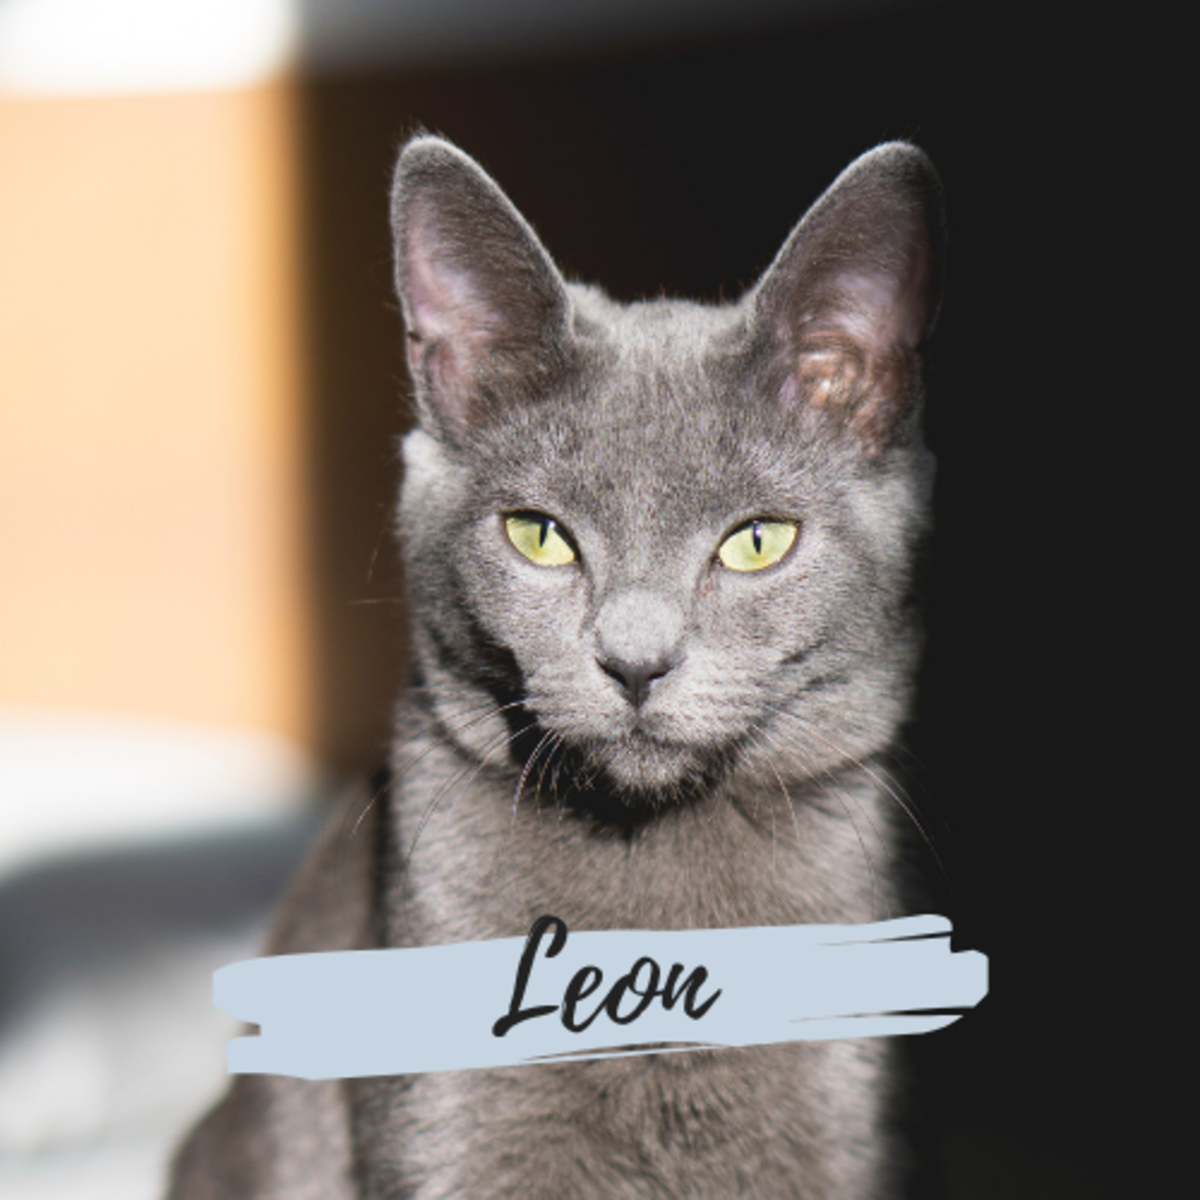 Is he a Leon?